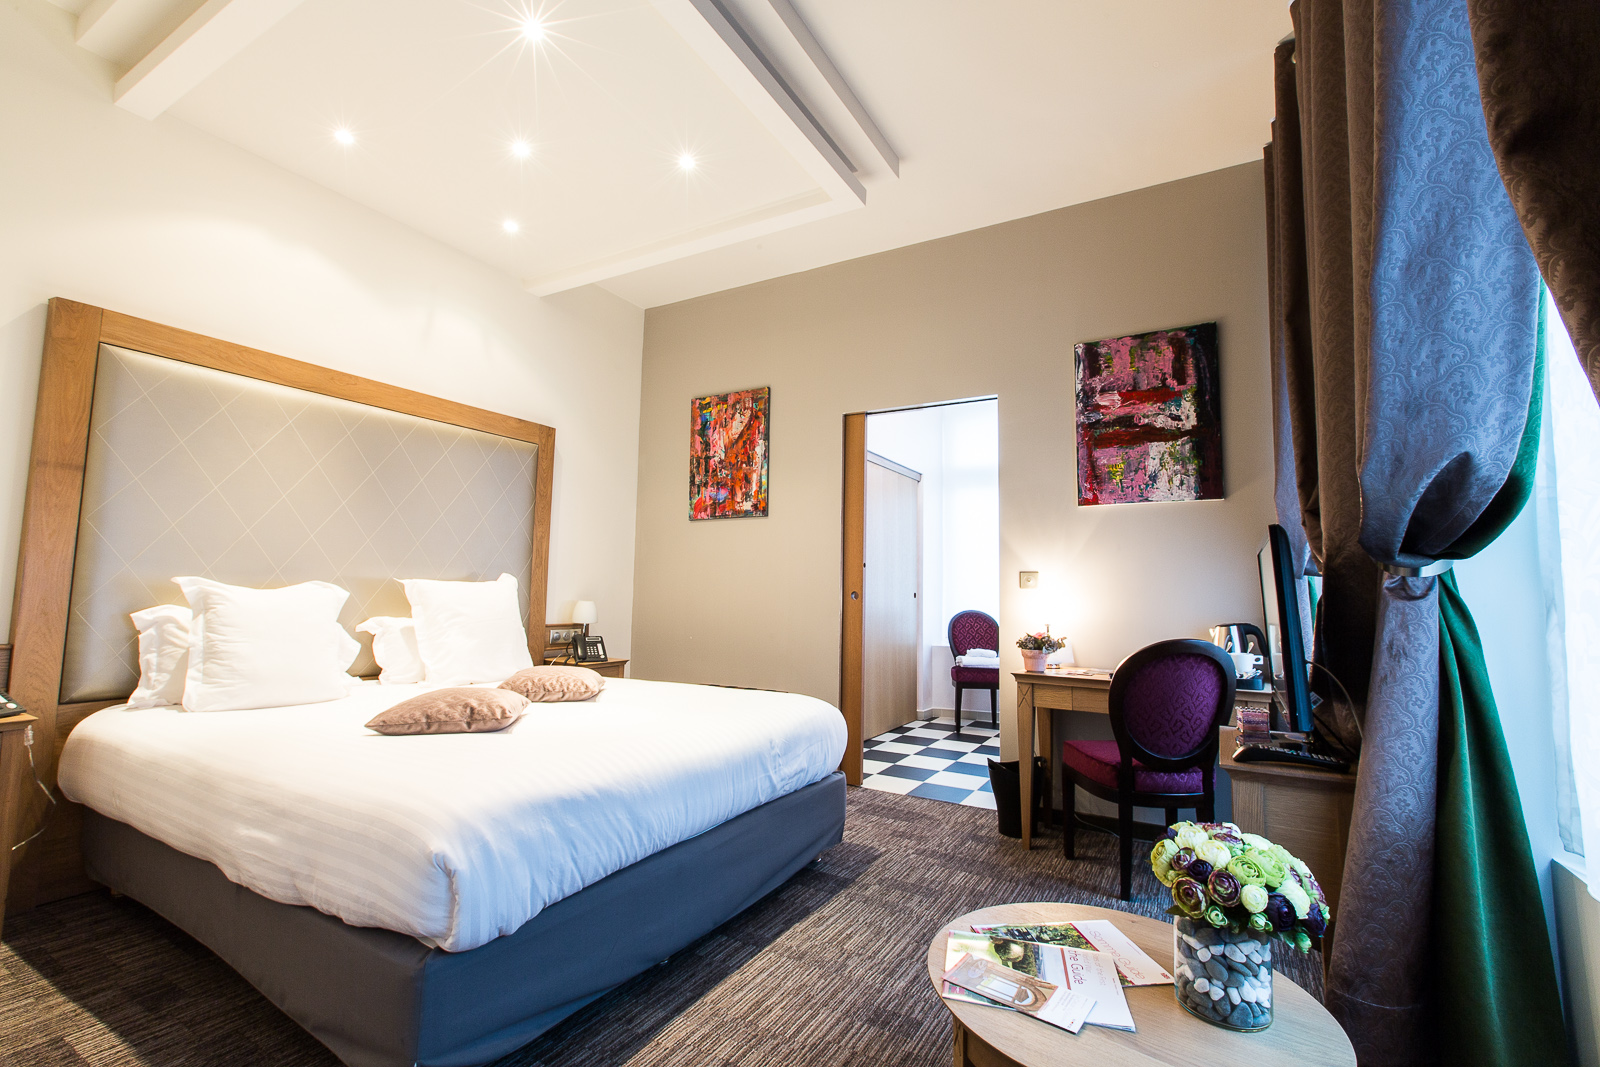 Hôtel Marotte chambre cosy